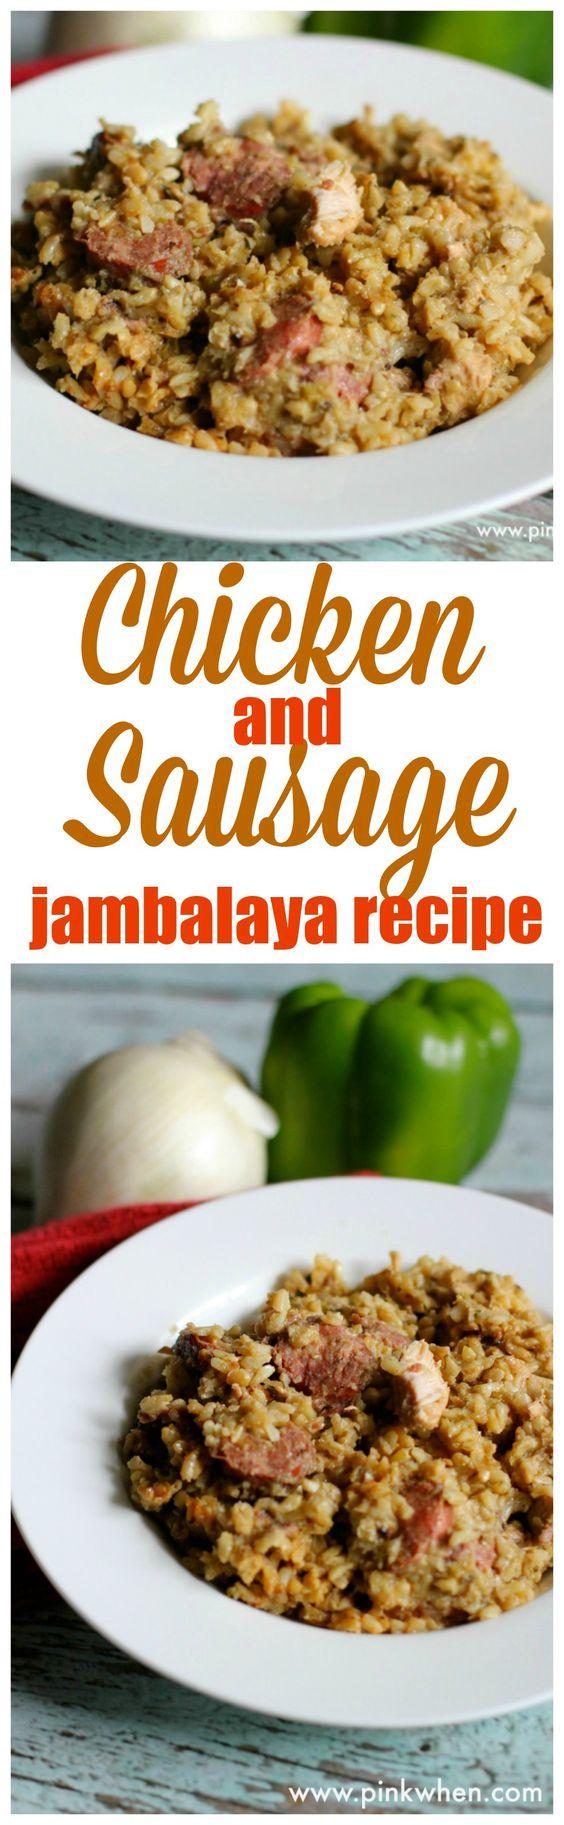 A delicious cajun dish! Chicken and Sausage Jambalaya recipe. YUM!